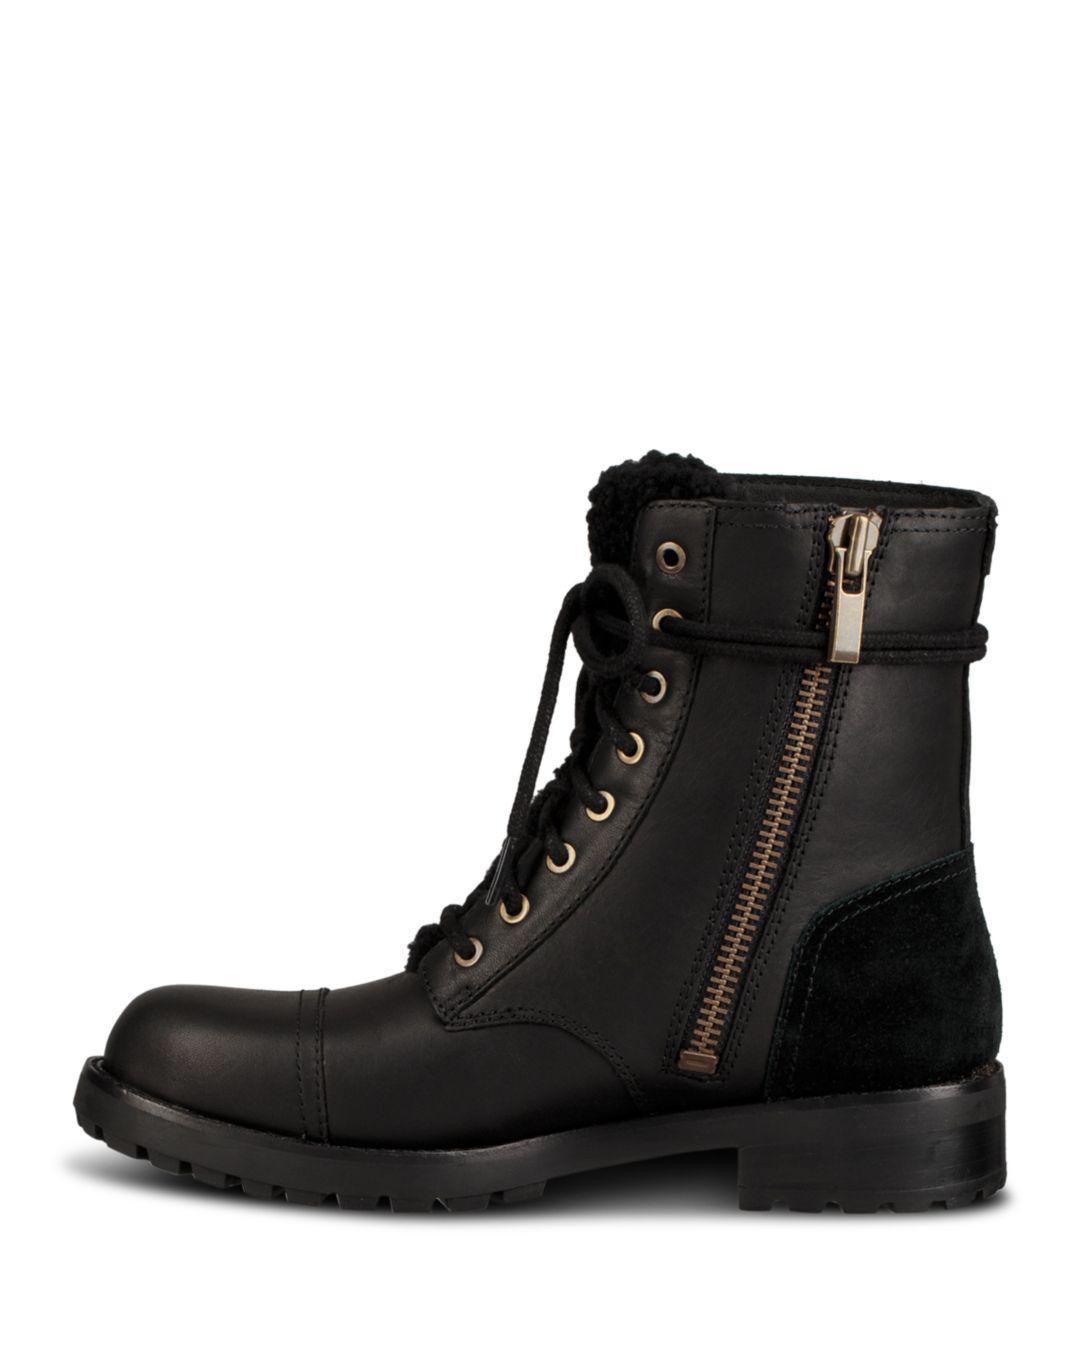 289b0ce95f9 Black Women's Kilmer Round Toe Leather & Sheepskin Boots